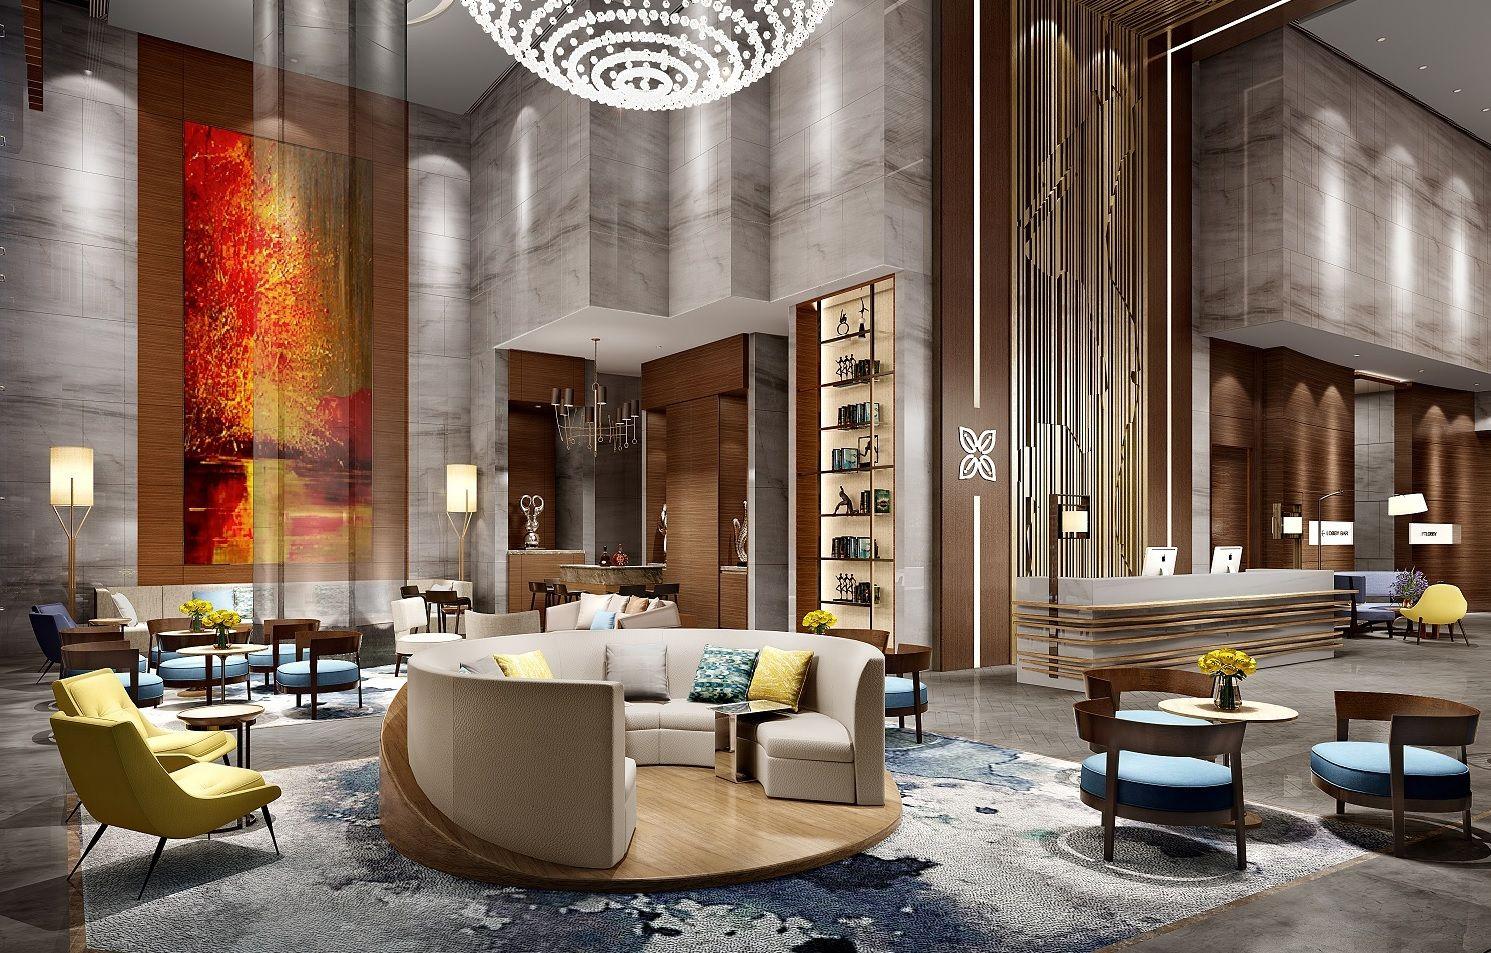 Hilton Garden Inn - Hong Kong | Lounge/Lobby | Pinterest | Office ...